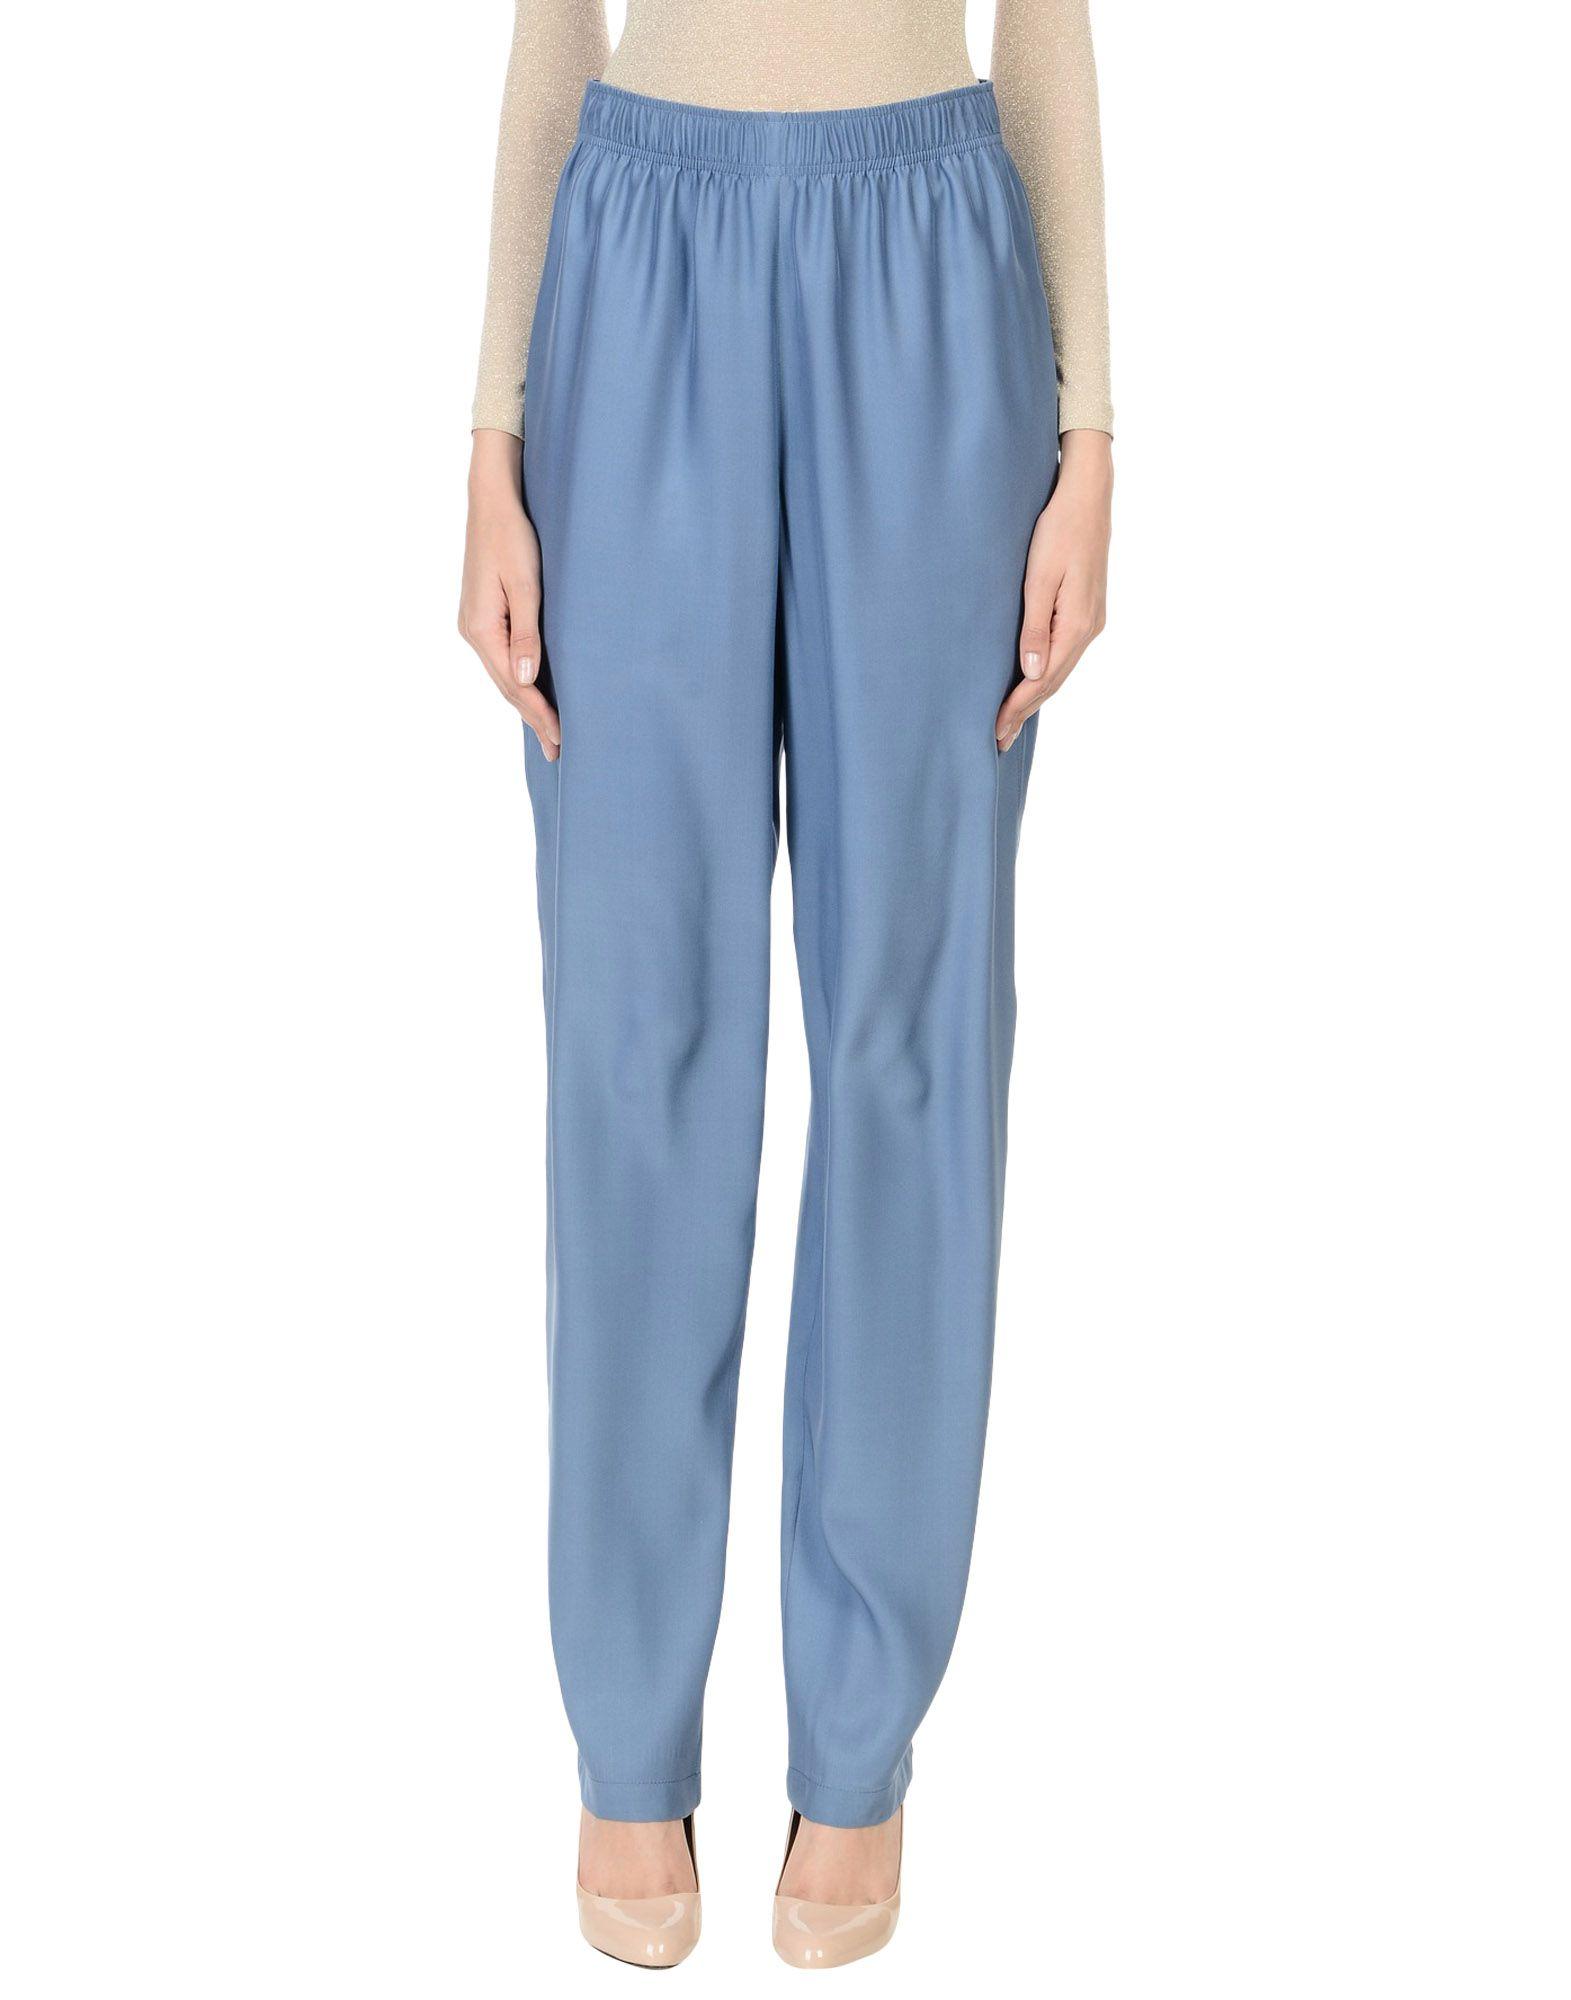 Pantalone Stella Mccartney Donna - Acquista online su